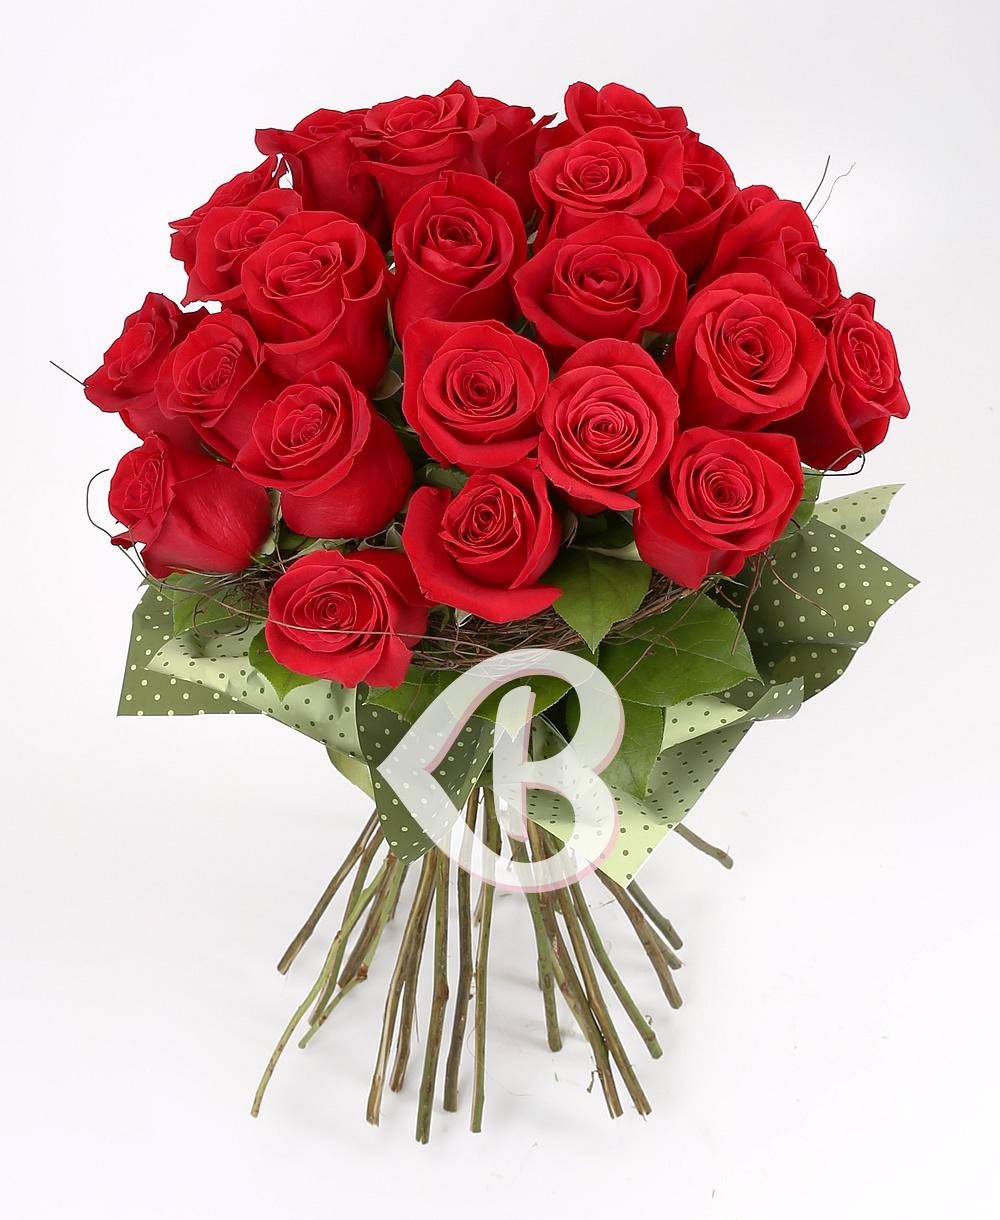 Imaginea produsului 35 Trandafiri Roșii (promo)